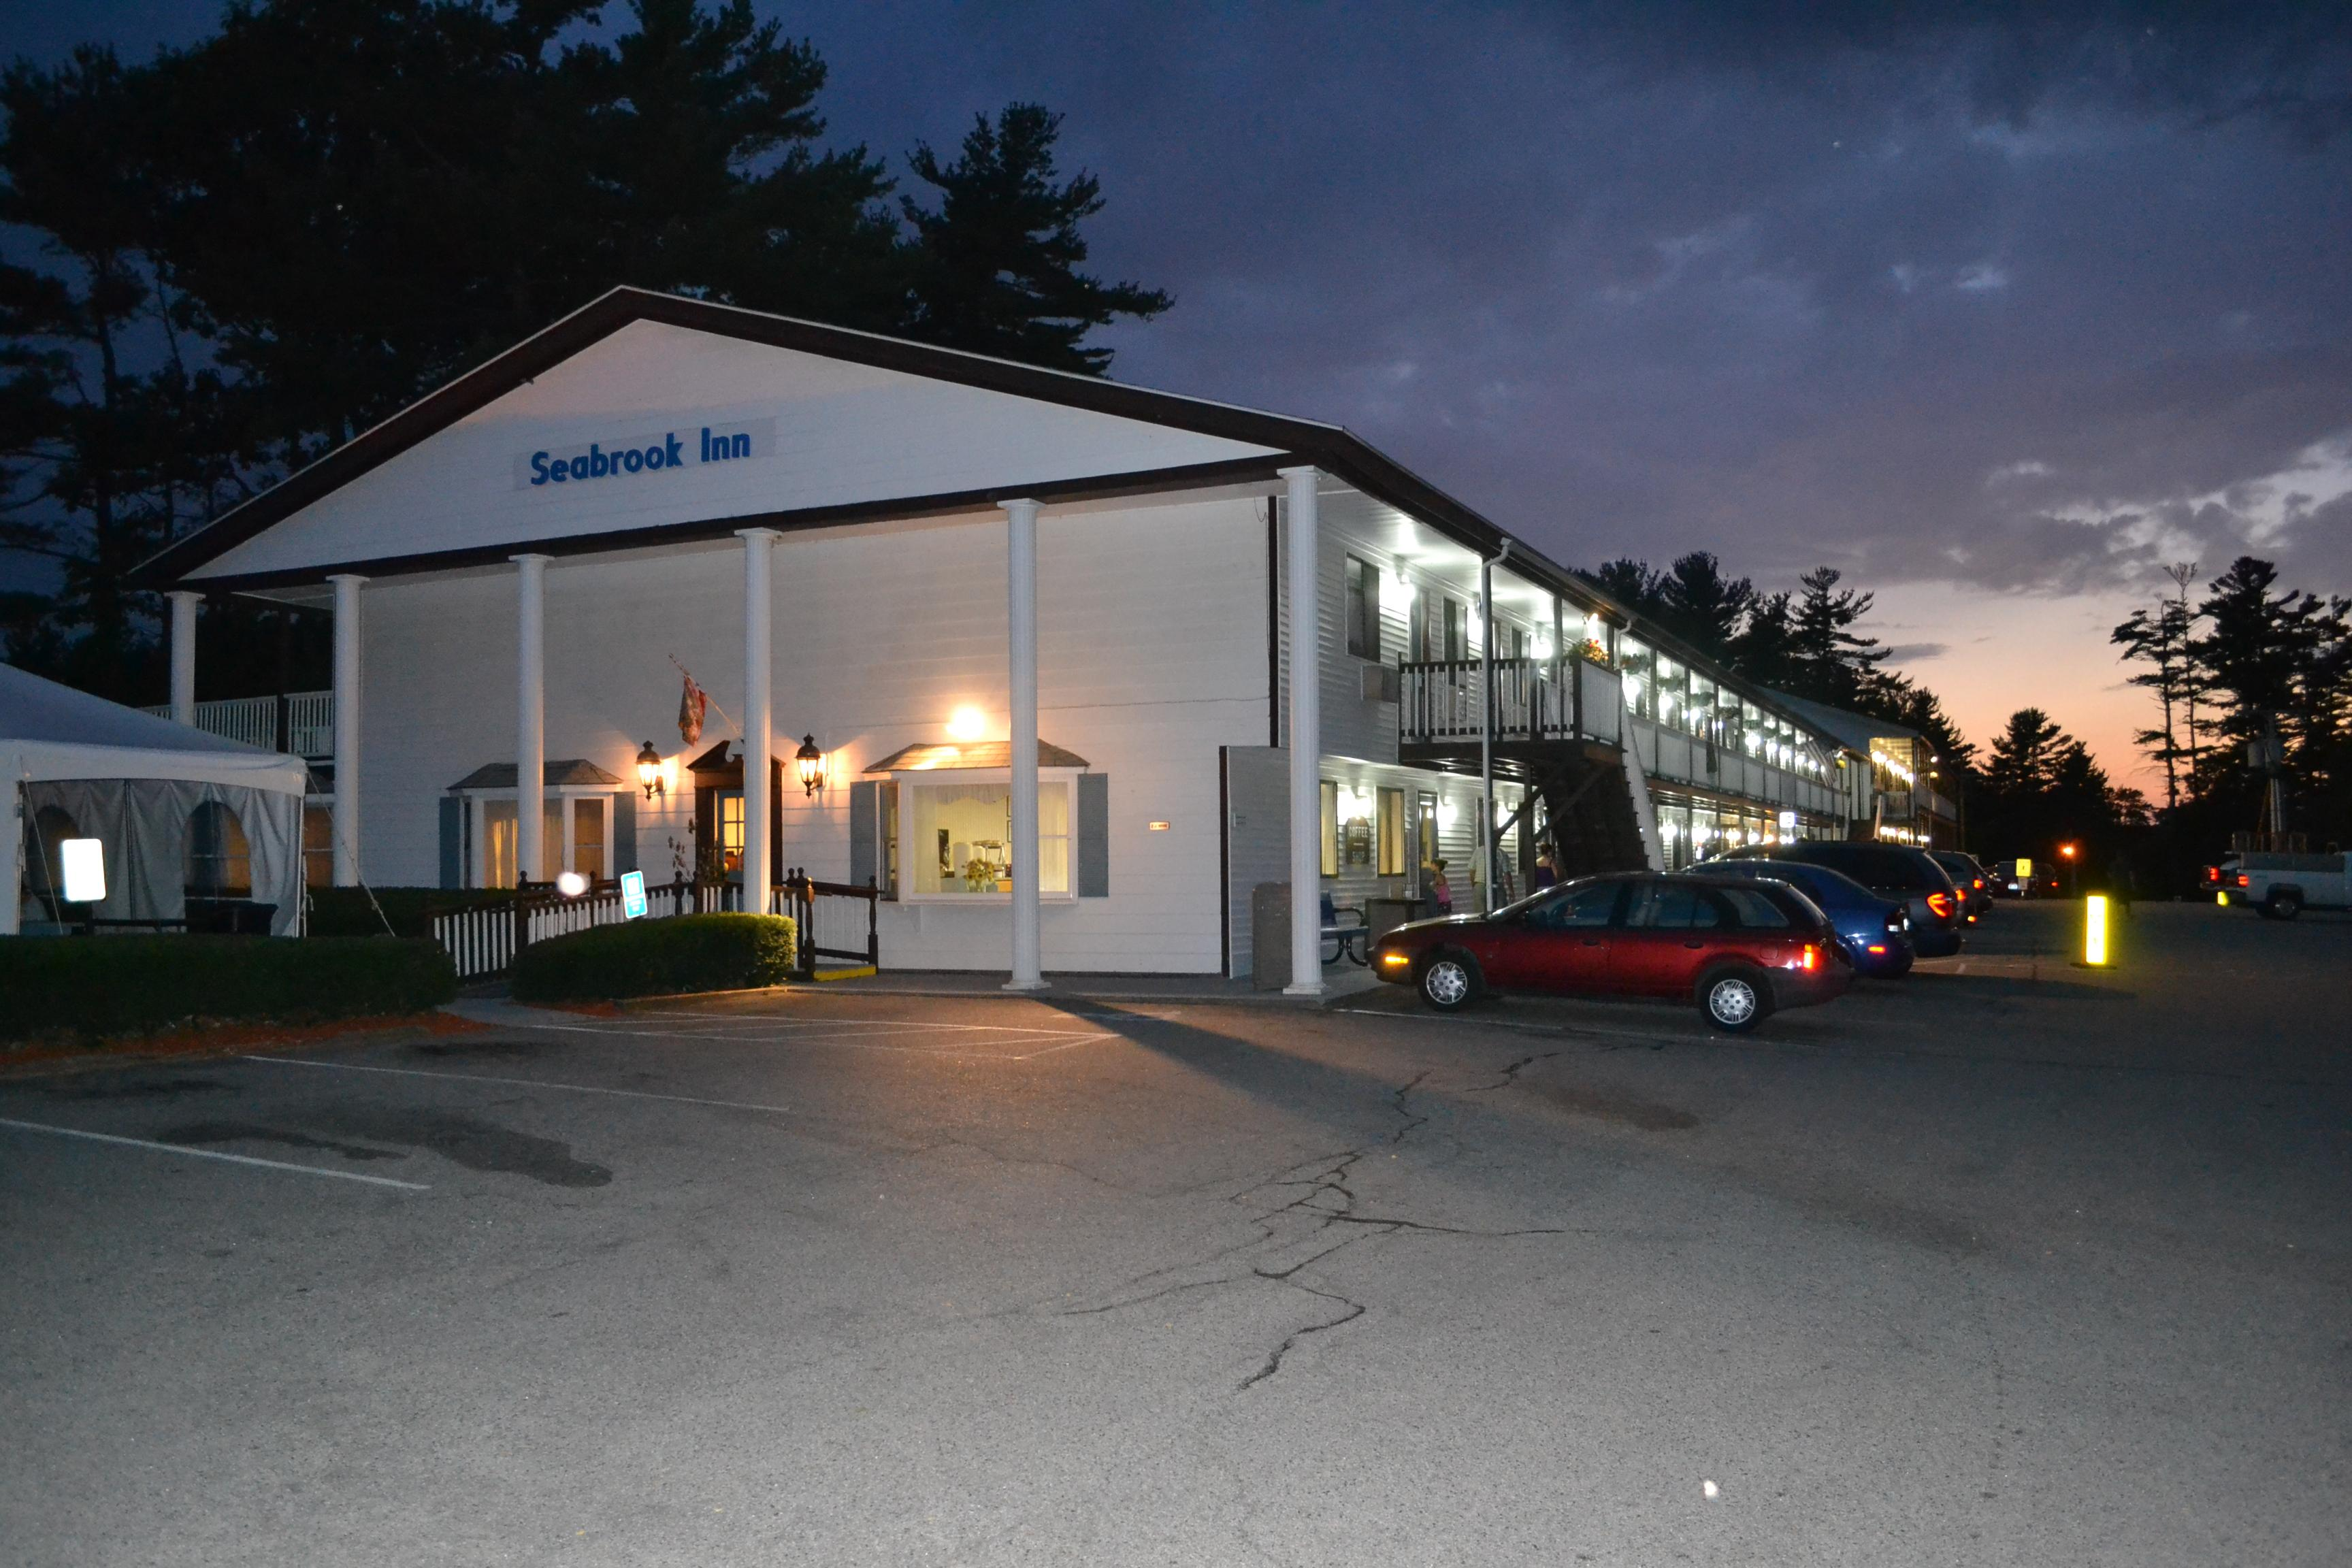 Seabrook Inn